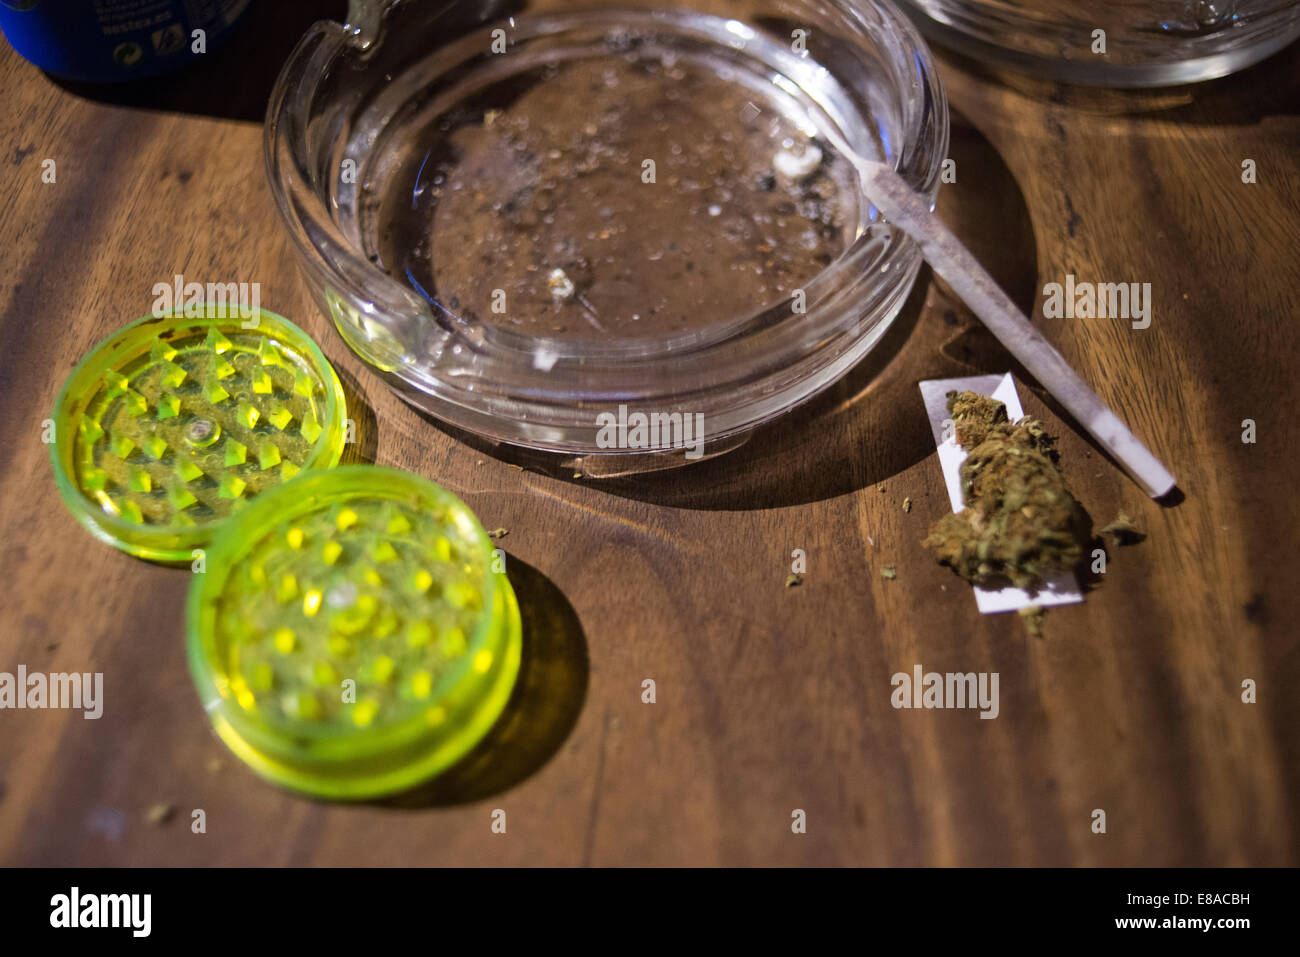 BARCELONA COFFEE SHOPS CANNABIS Marijuana In Barcelona.  Man's hands rolling marijuana joint inside the Kush - Stock Image